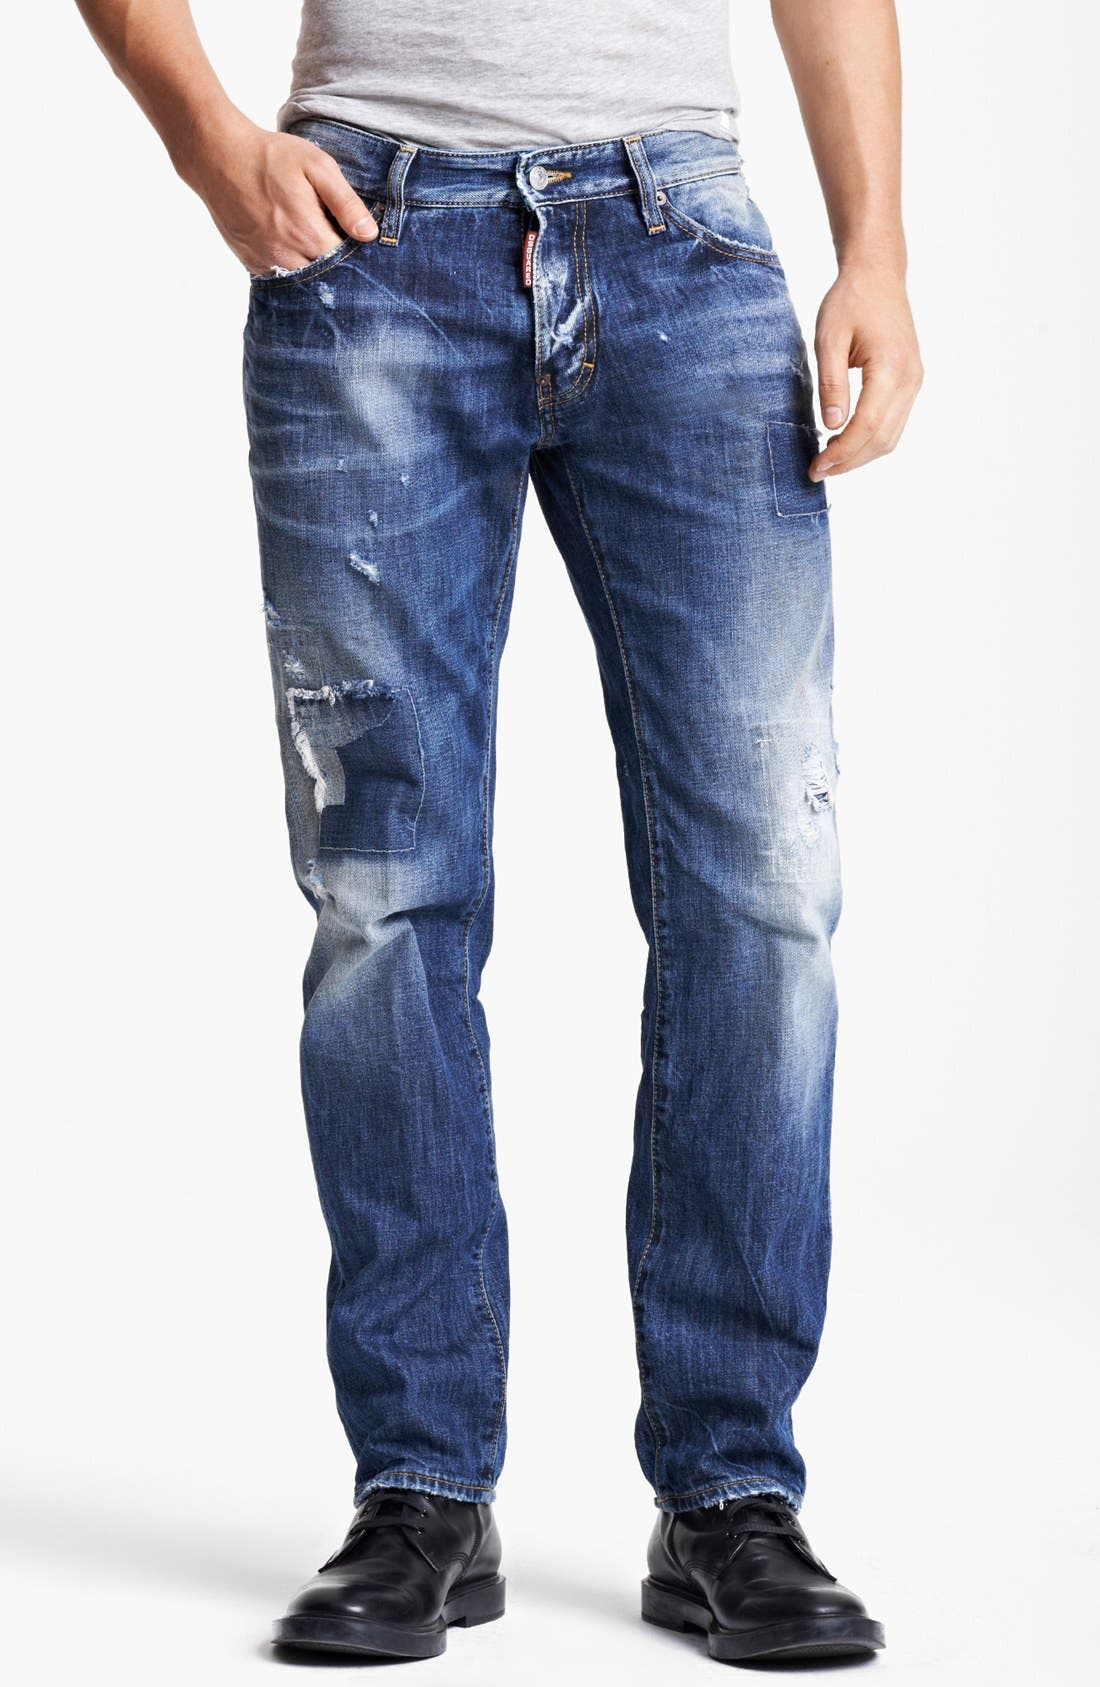 Main Image - Dsquared2 'Dean' Slim Fit Jeans (Distressed Blue)